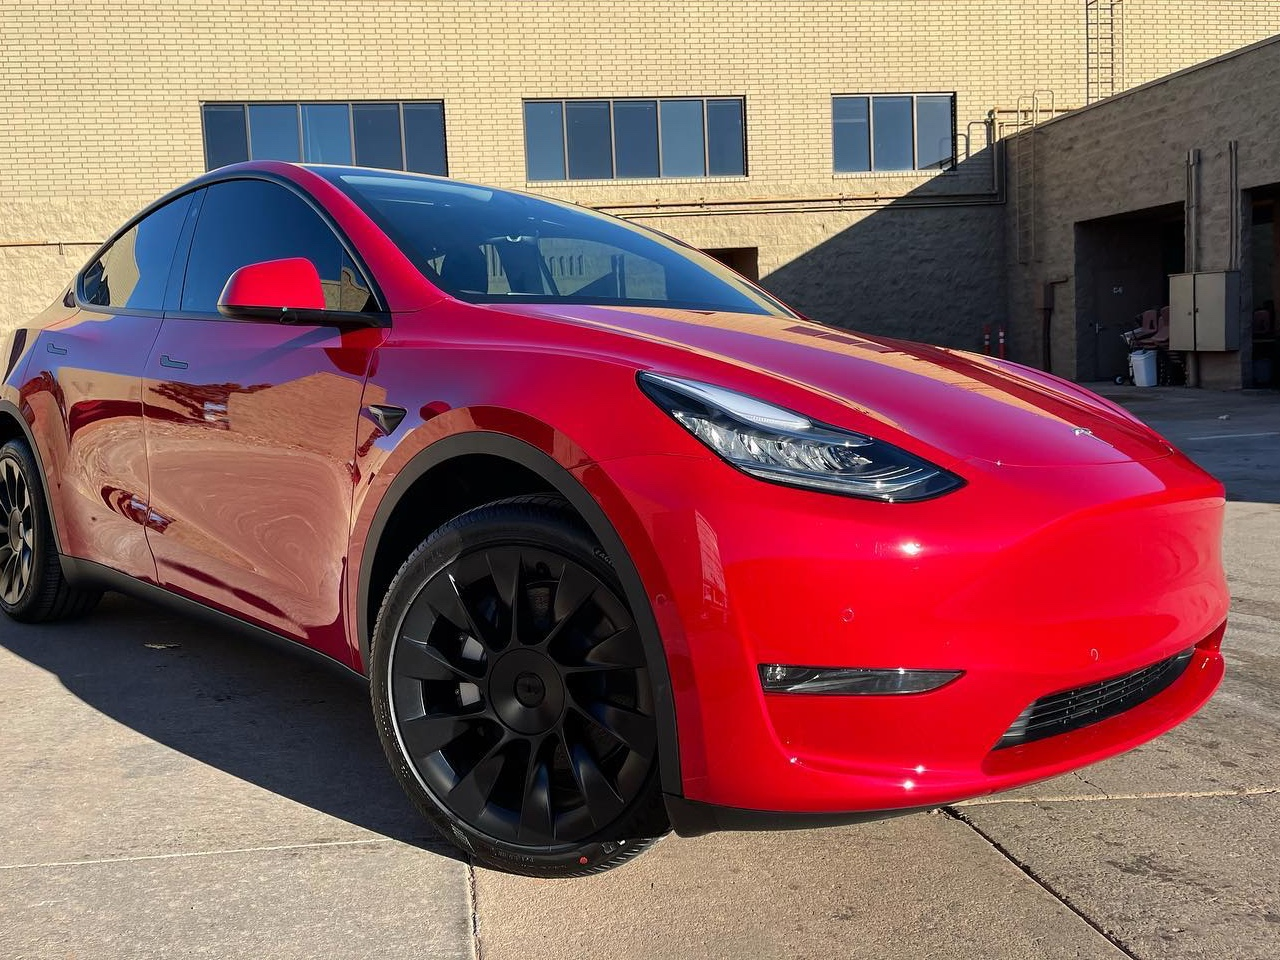 Tesla Model Y front view Full Front End PPF + Ceramic Coating + Ceramic Tint!